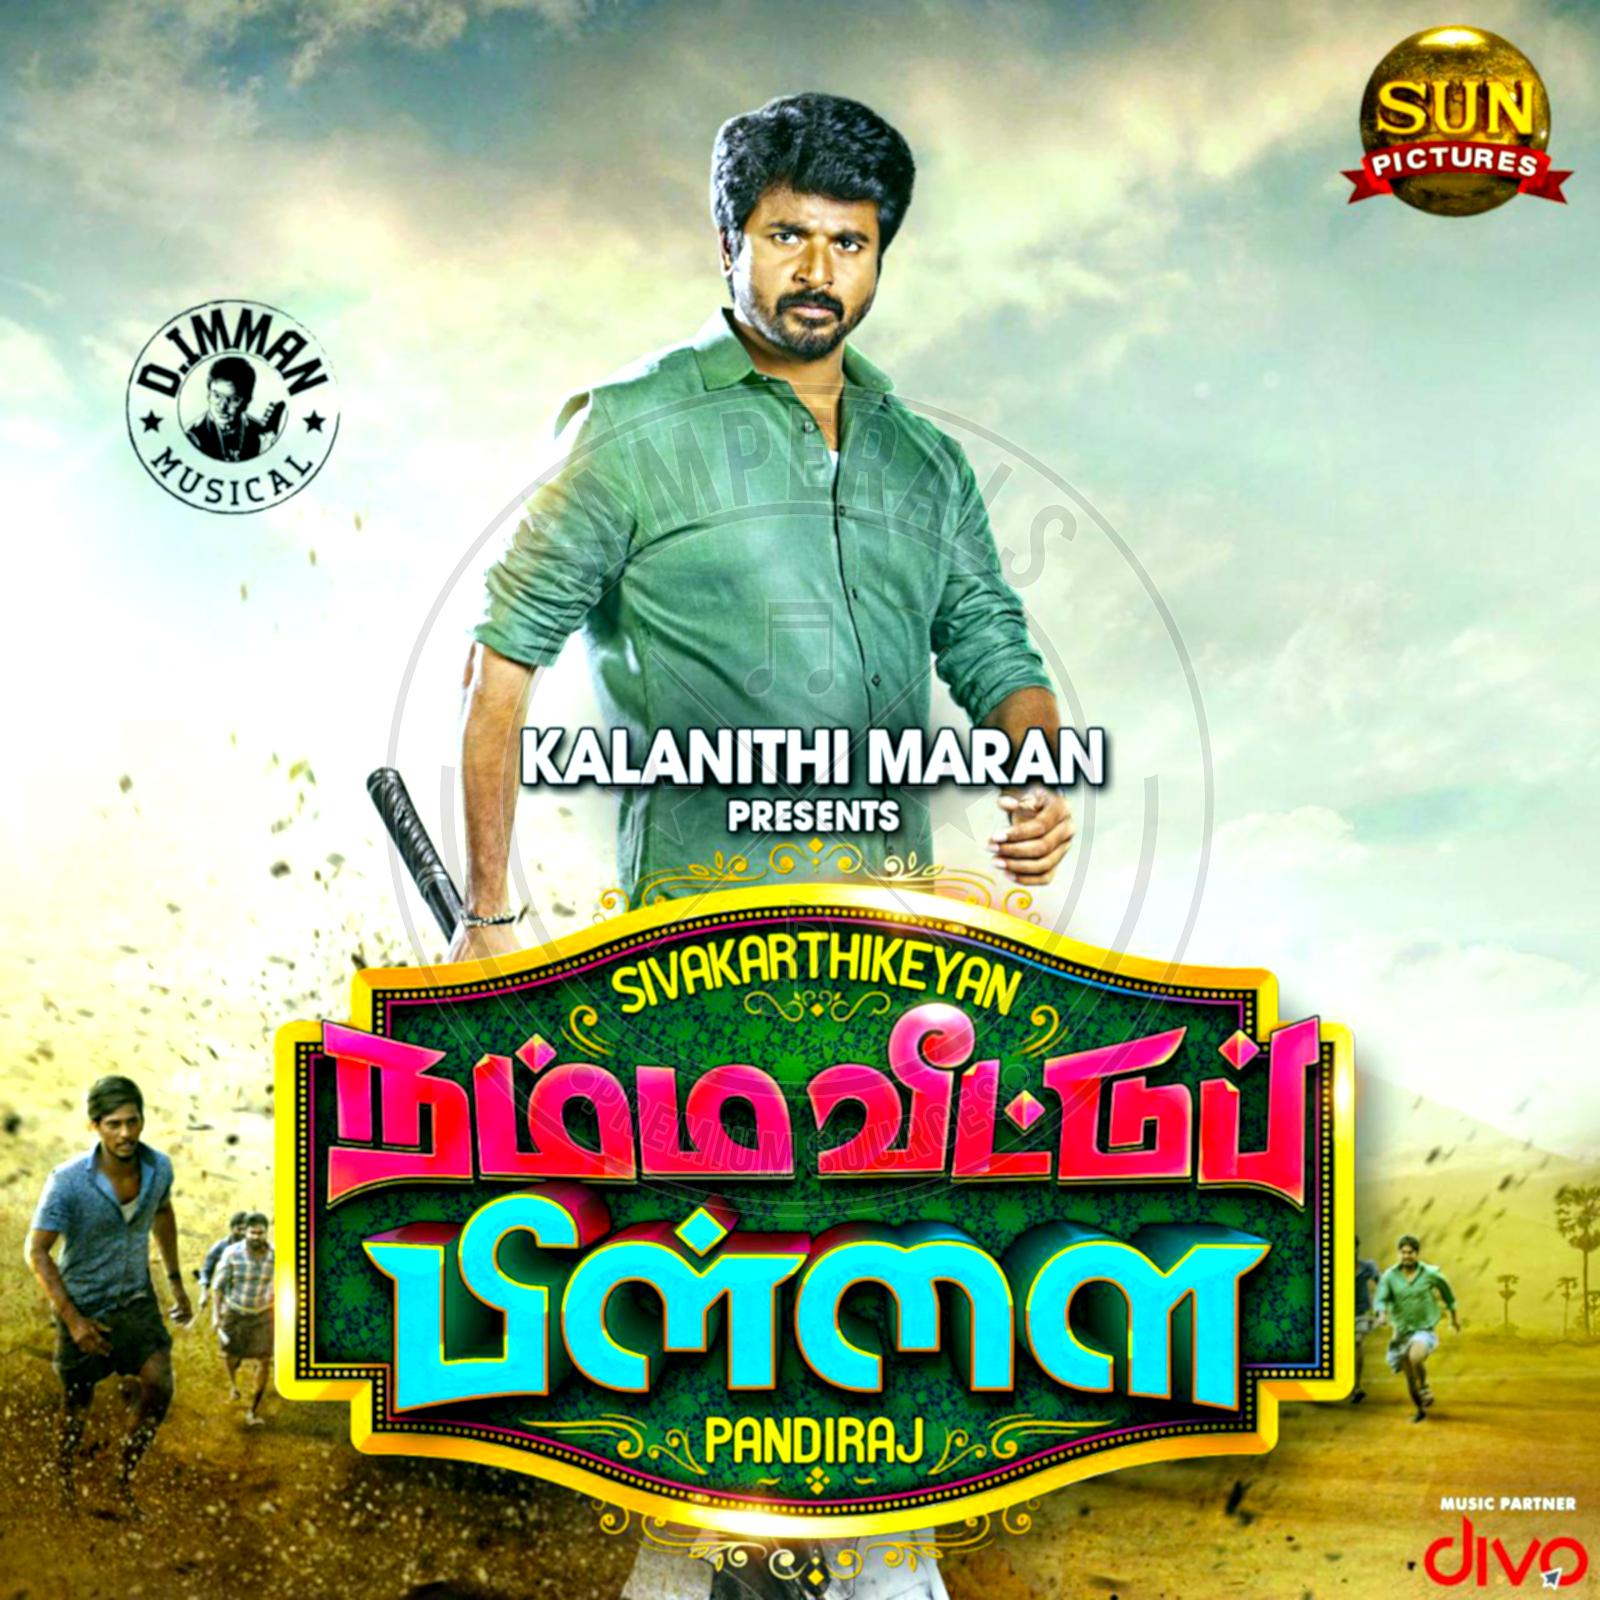 Mp3 Song Download Tamil Mp3 Song Download Tamil Audio Songs Free Download Mp3 Song Download Old Song Download